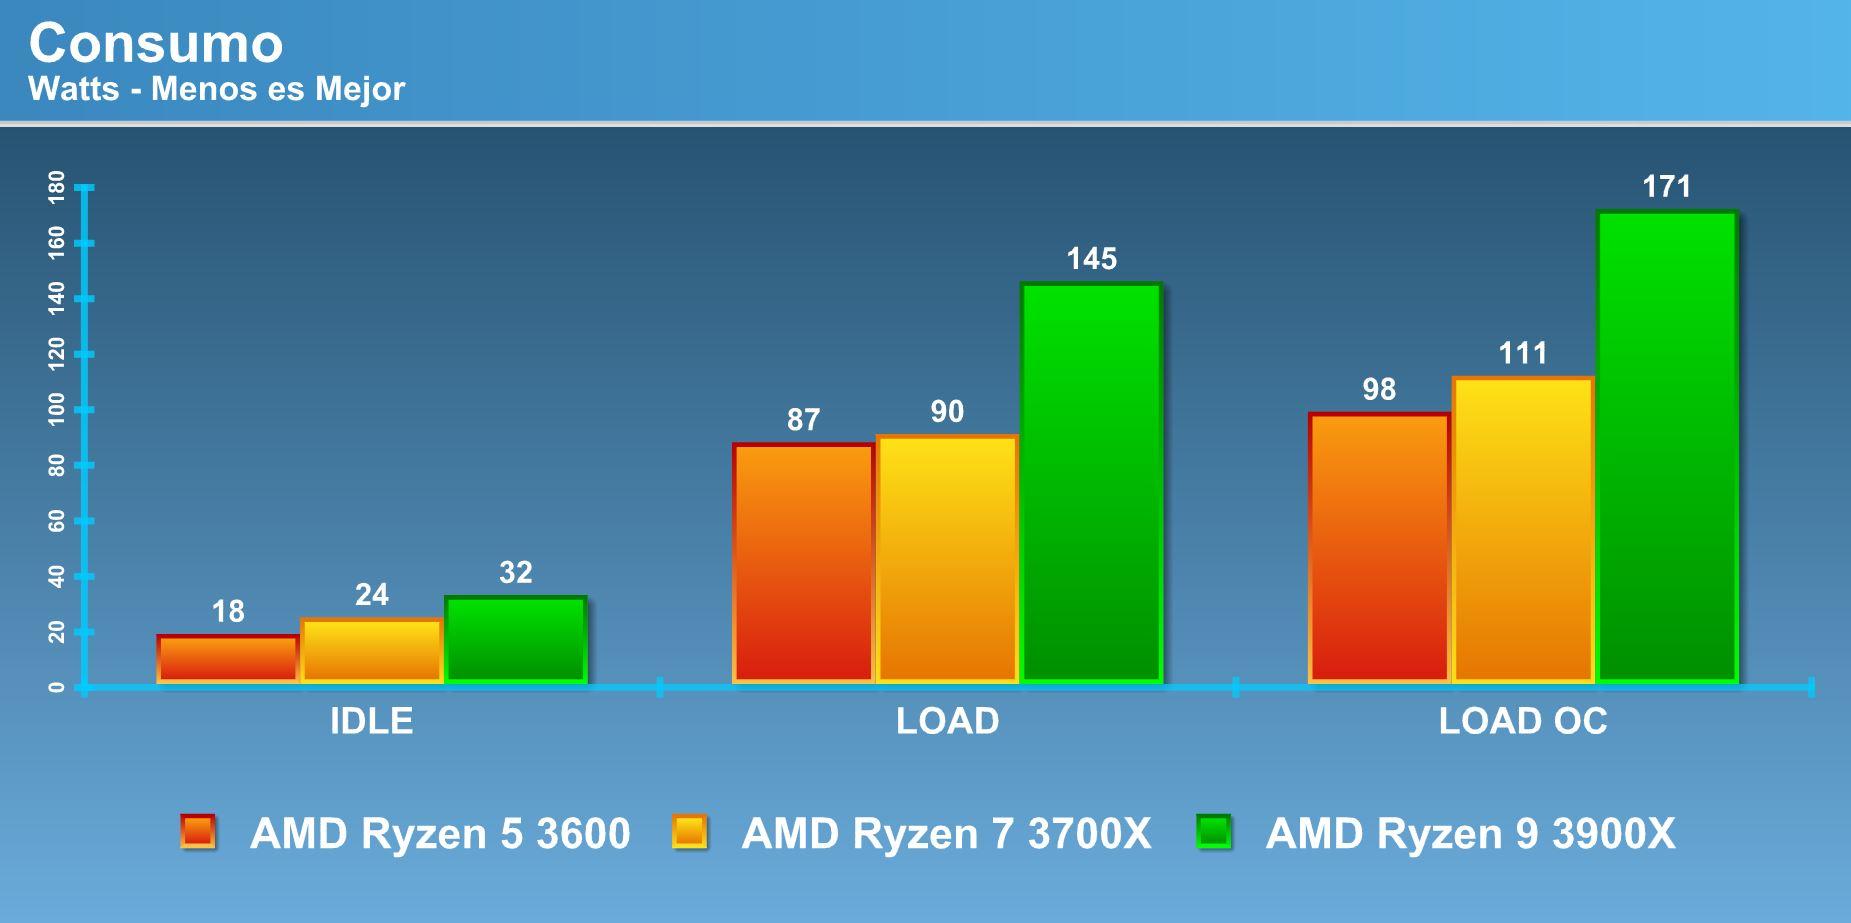 Review AMD Ryzen 9 3900X, Ryzen 7 3700X and Ryzen 5 3600 | – uneath